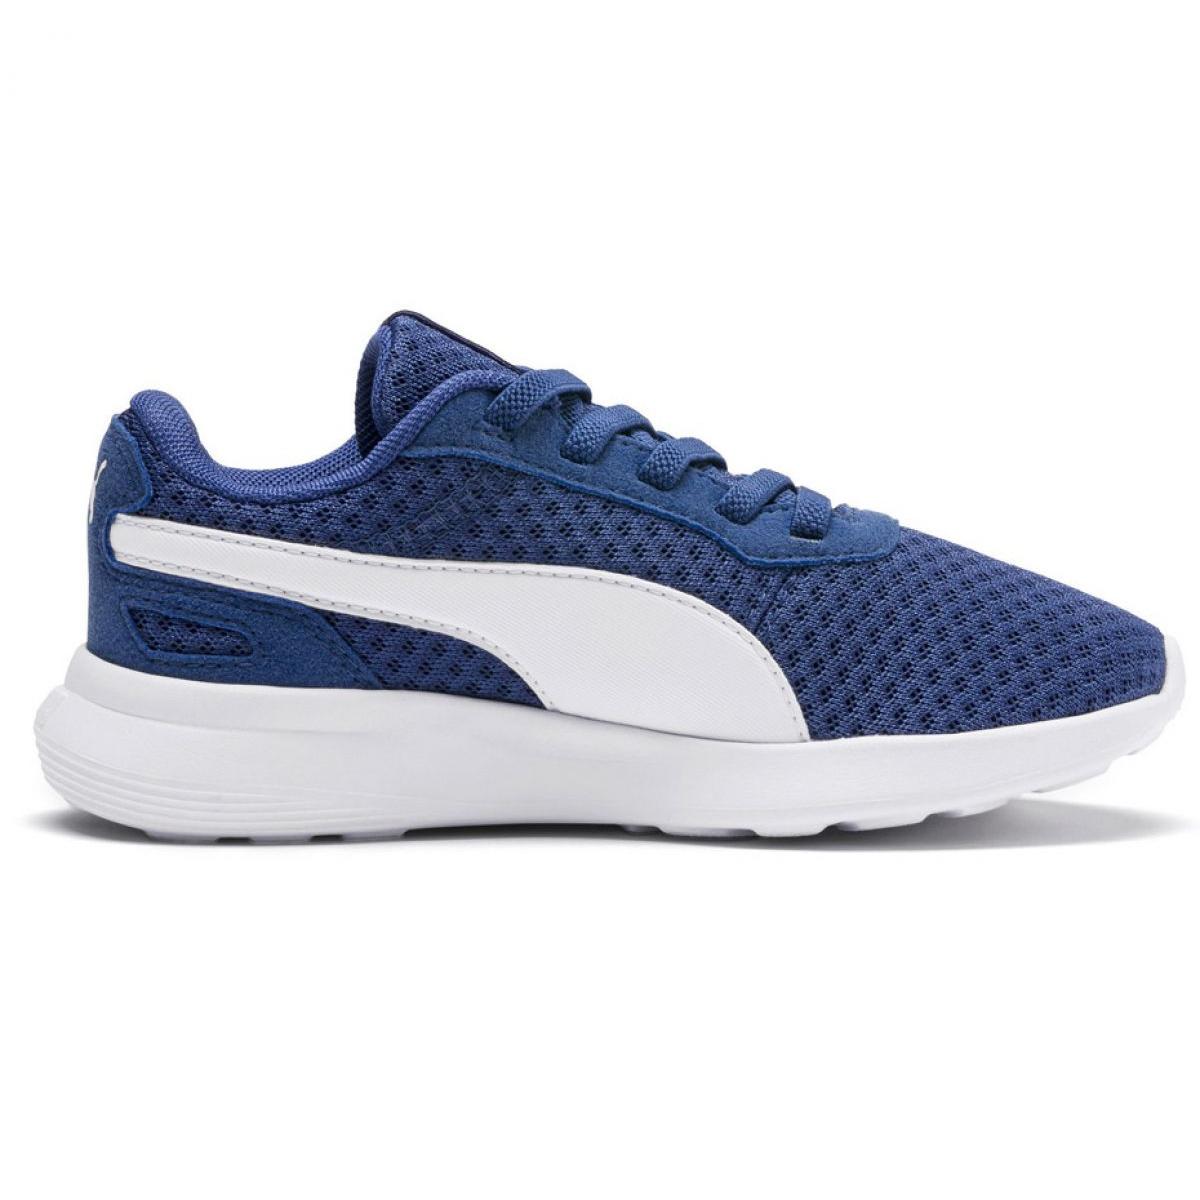 Detalles de Zapatos Puma St activar Ac Ps Jr 369070 08 Azul ver título original